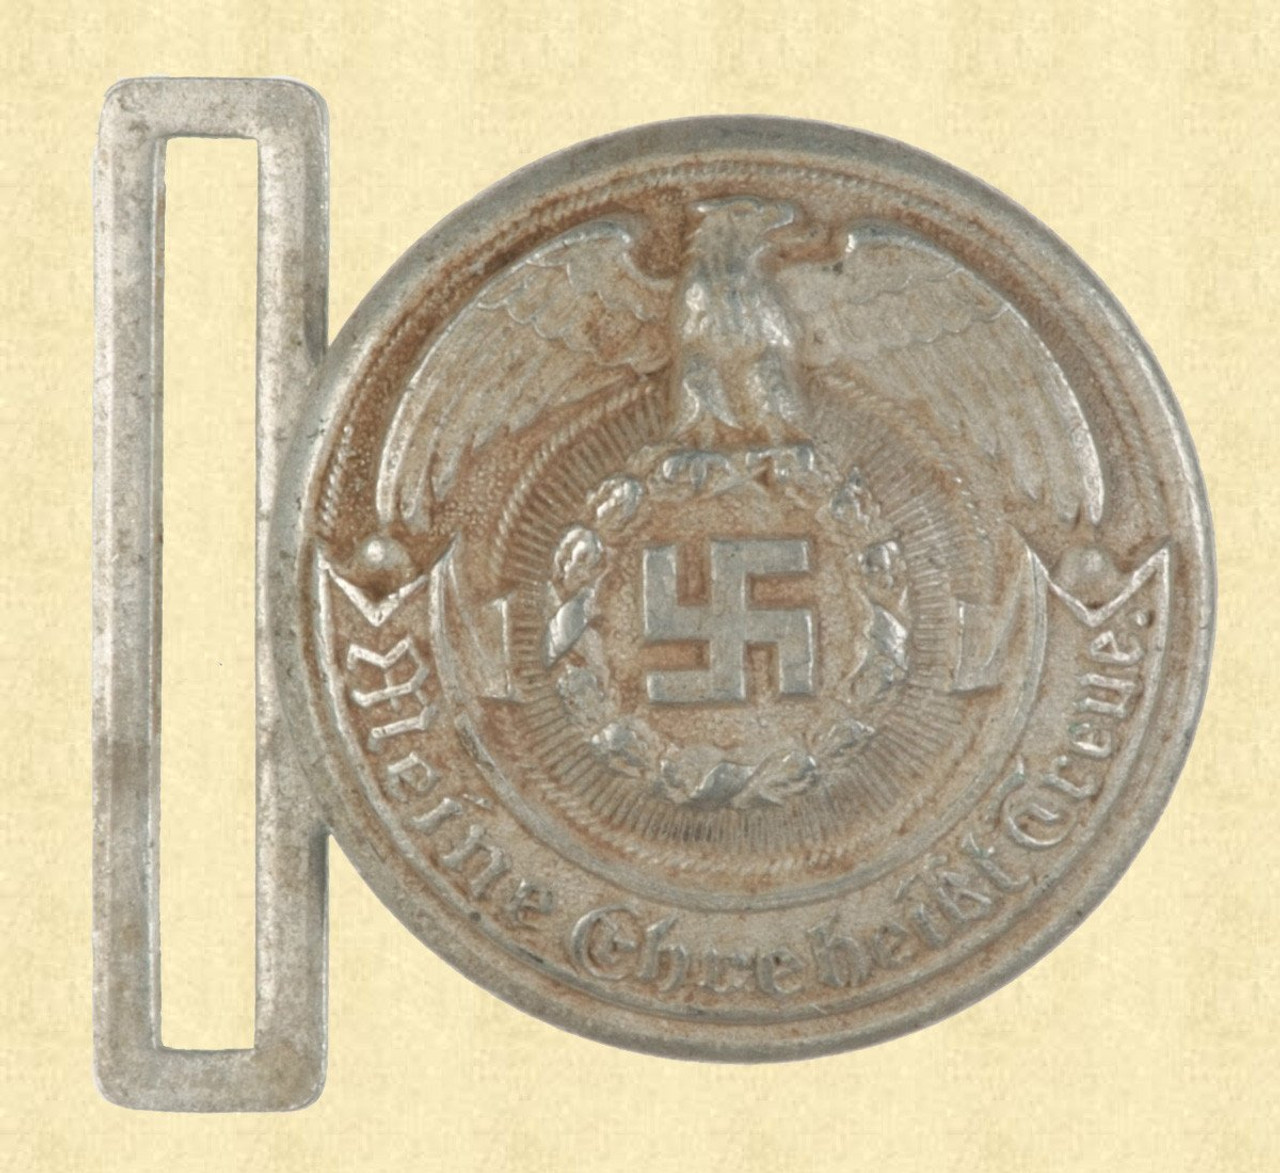 GERMAN BELT BUCKLE - C9700